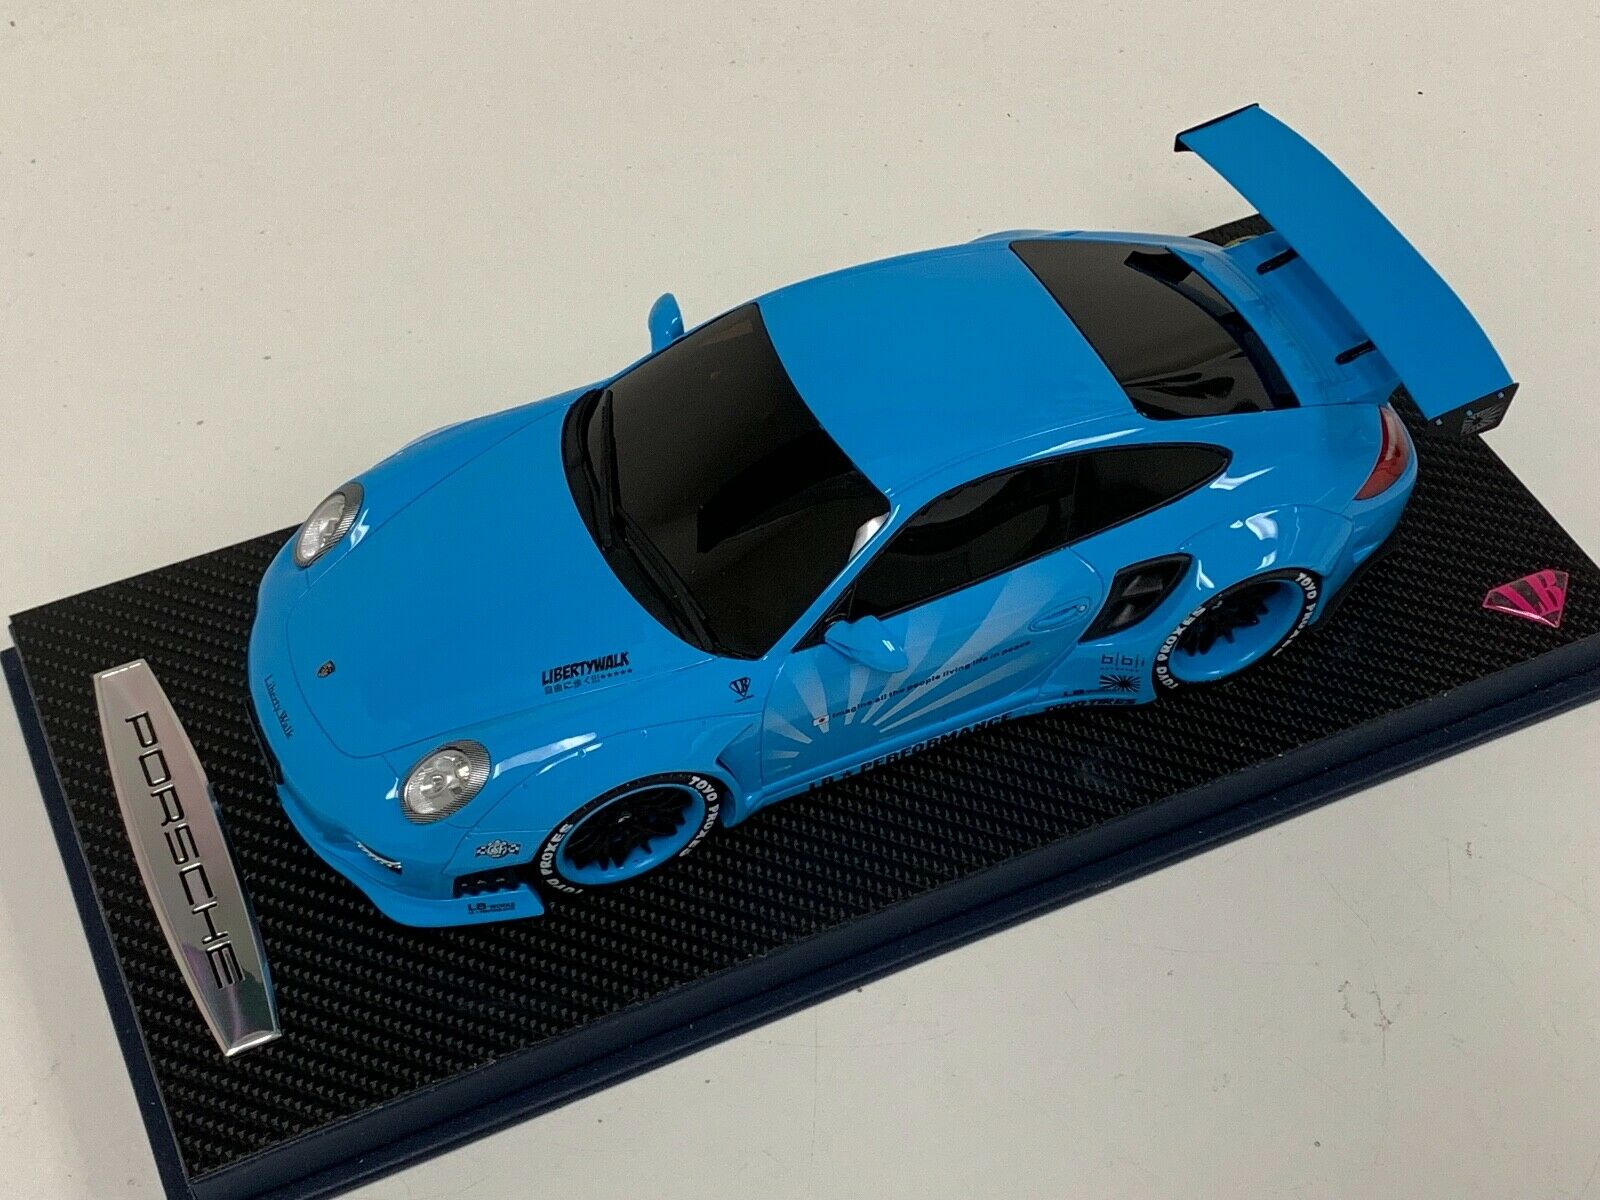 1 18 GT Spirit Porsche 997 LB (environ 452.23 kg) Performance Liberty Walk BABY bleu WHEELS KJ011